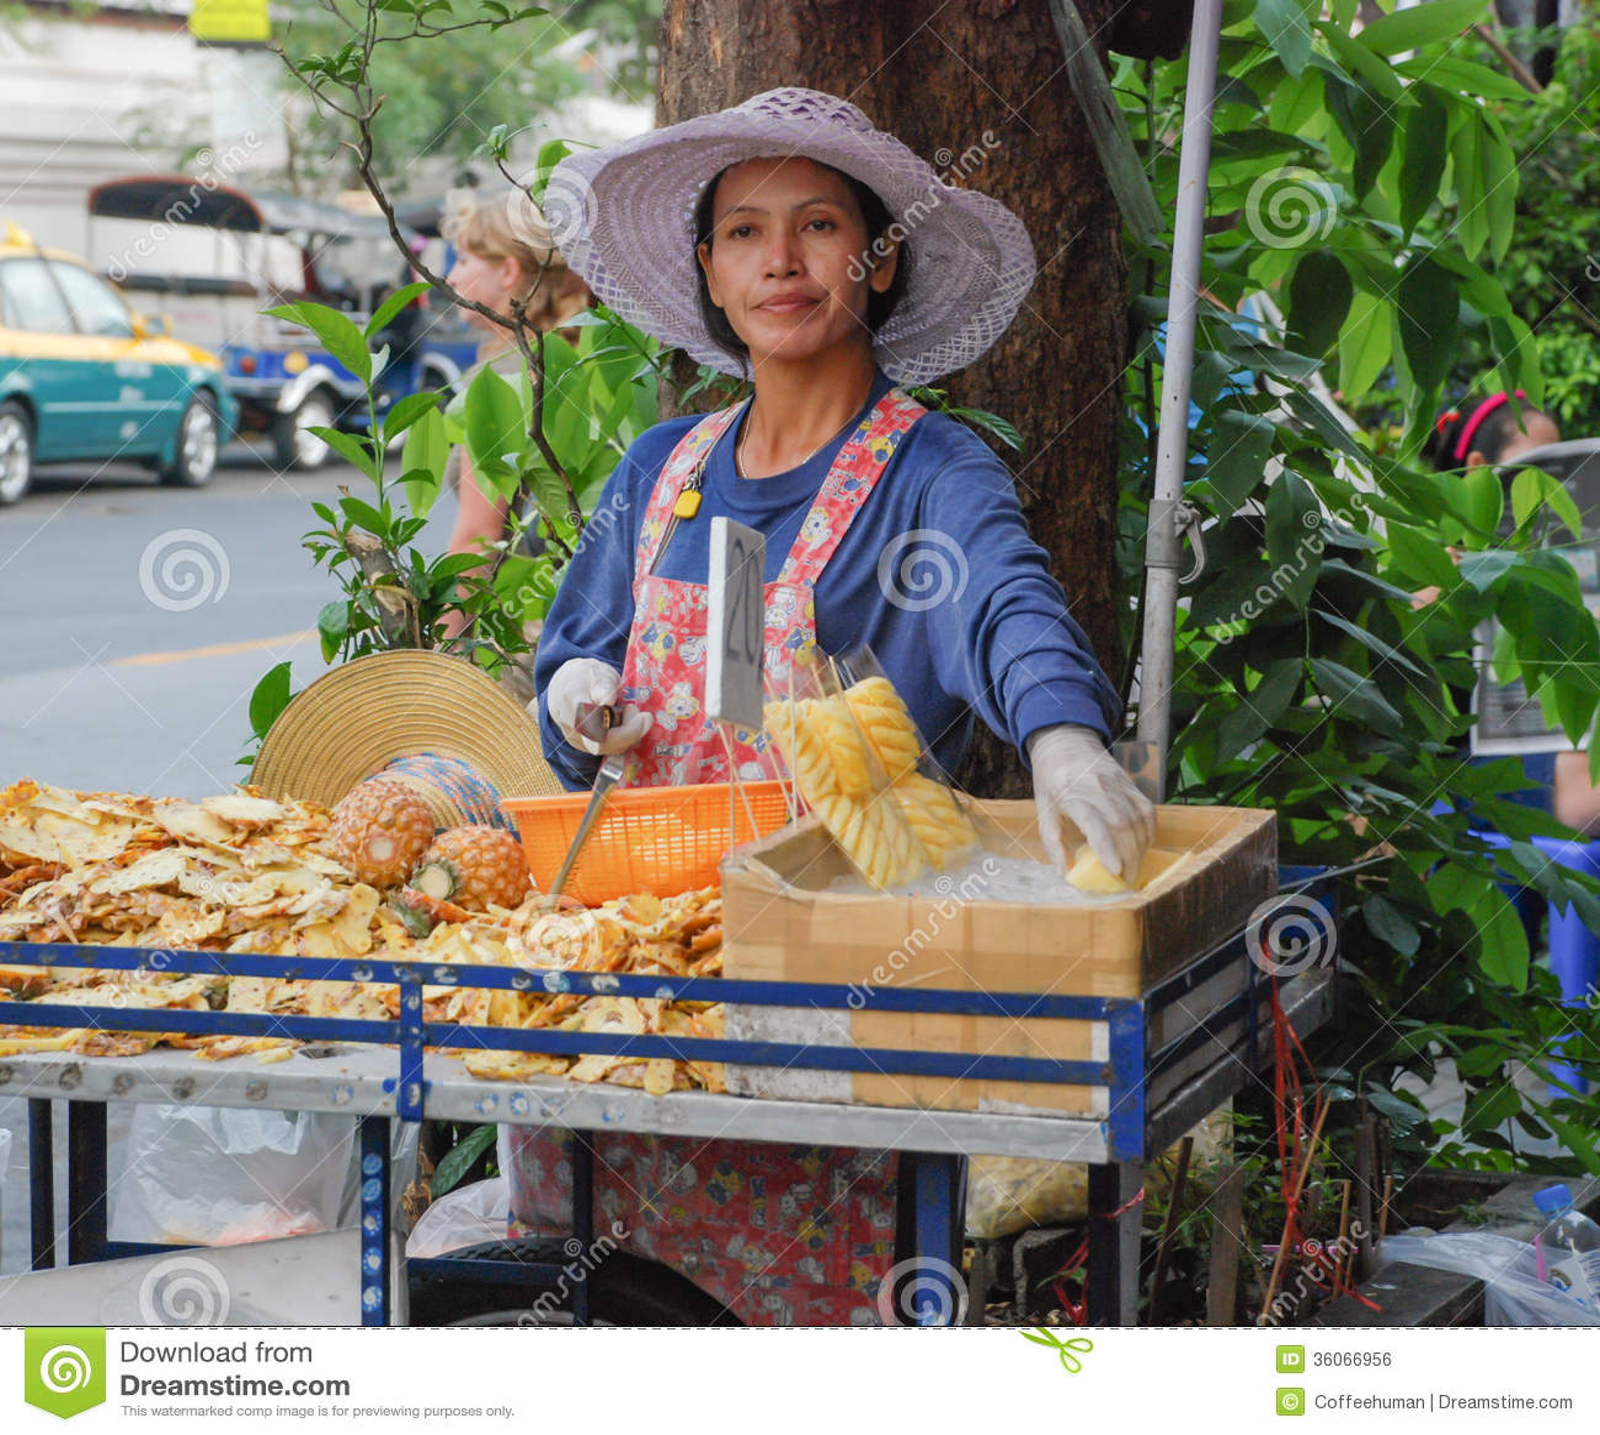 Street food business plan